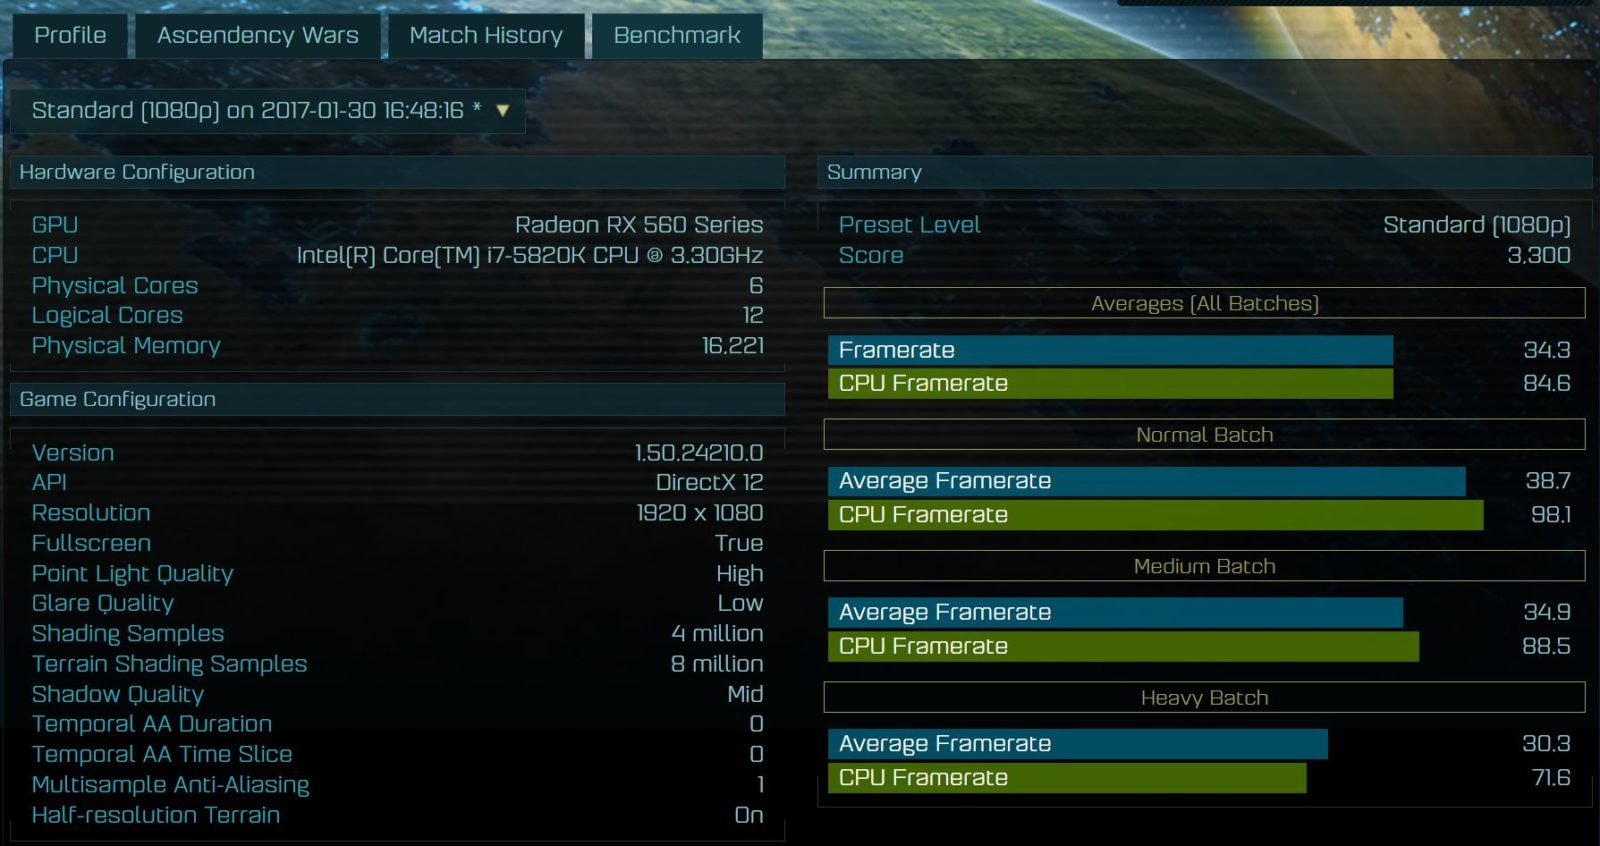 AMD-Radeon-RX-560-AotS-1600x846